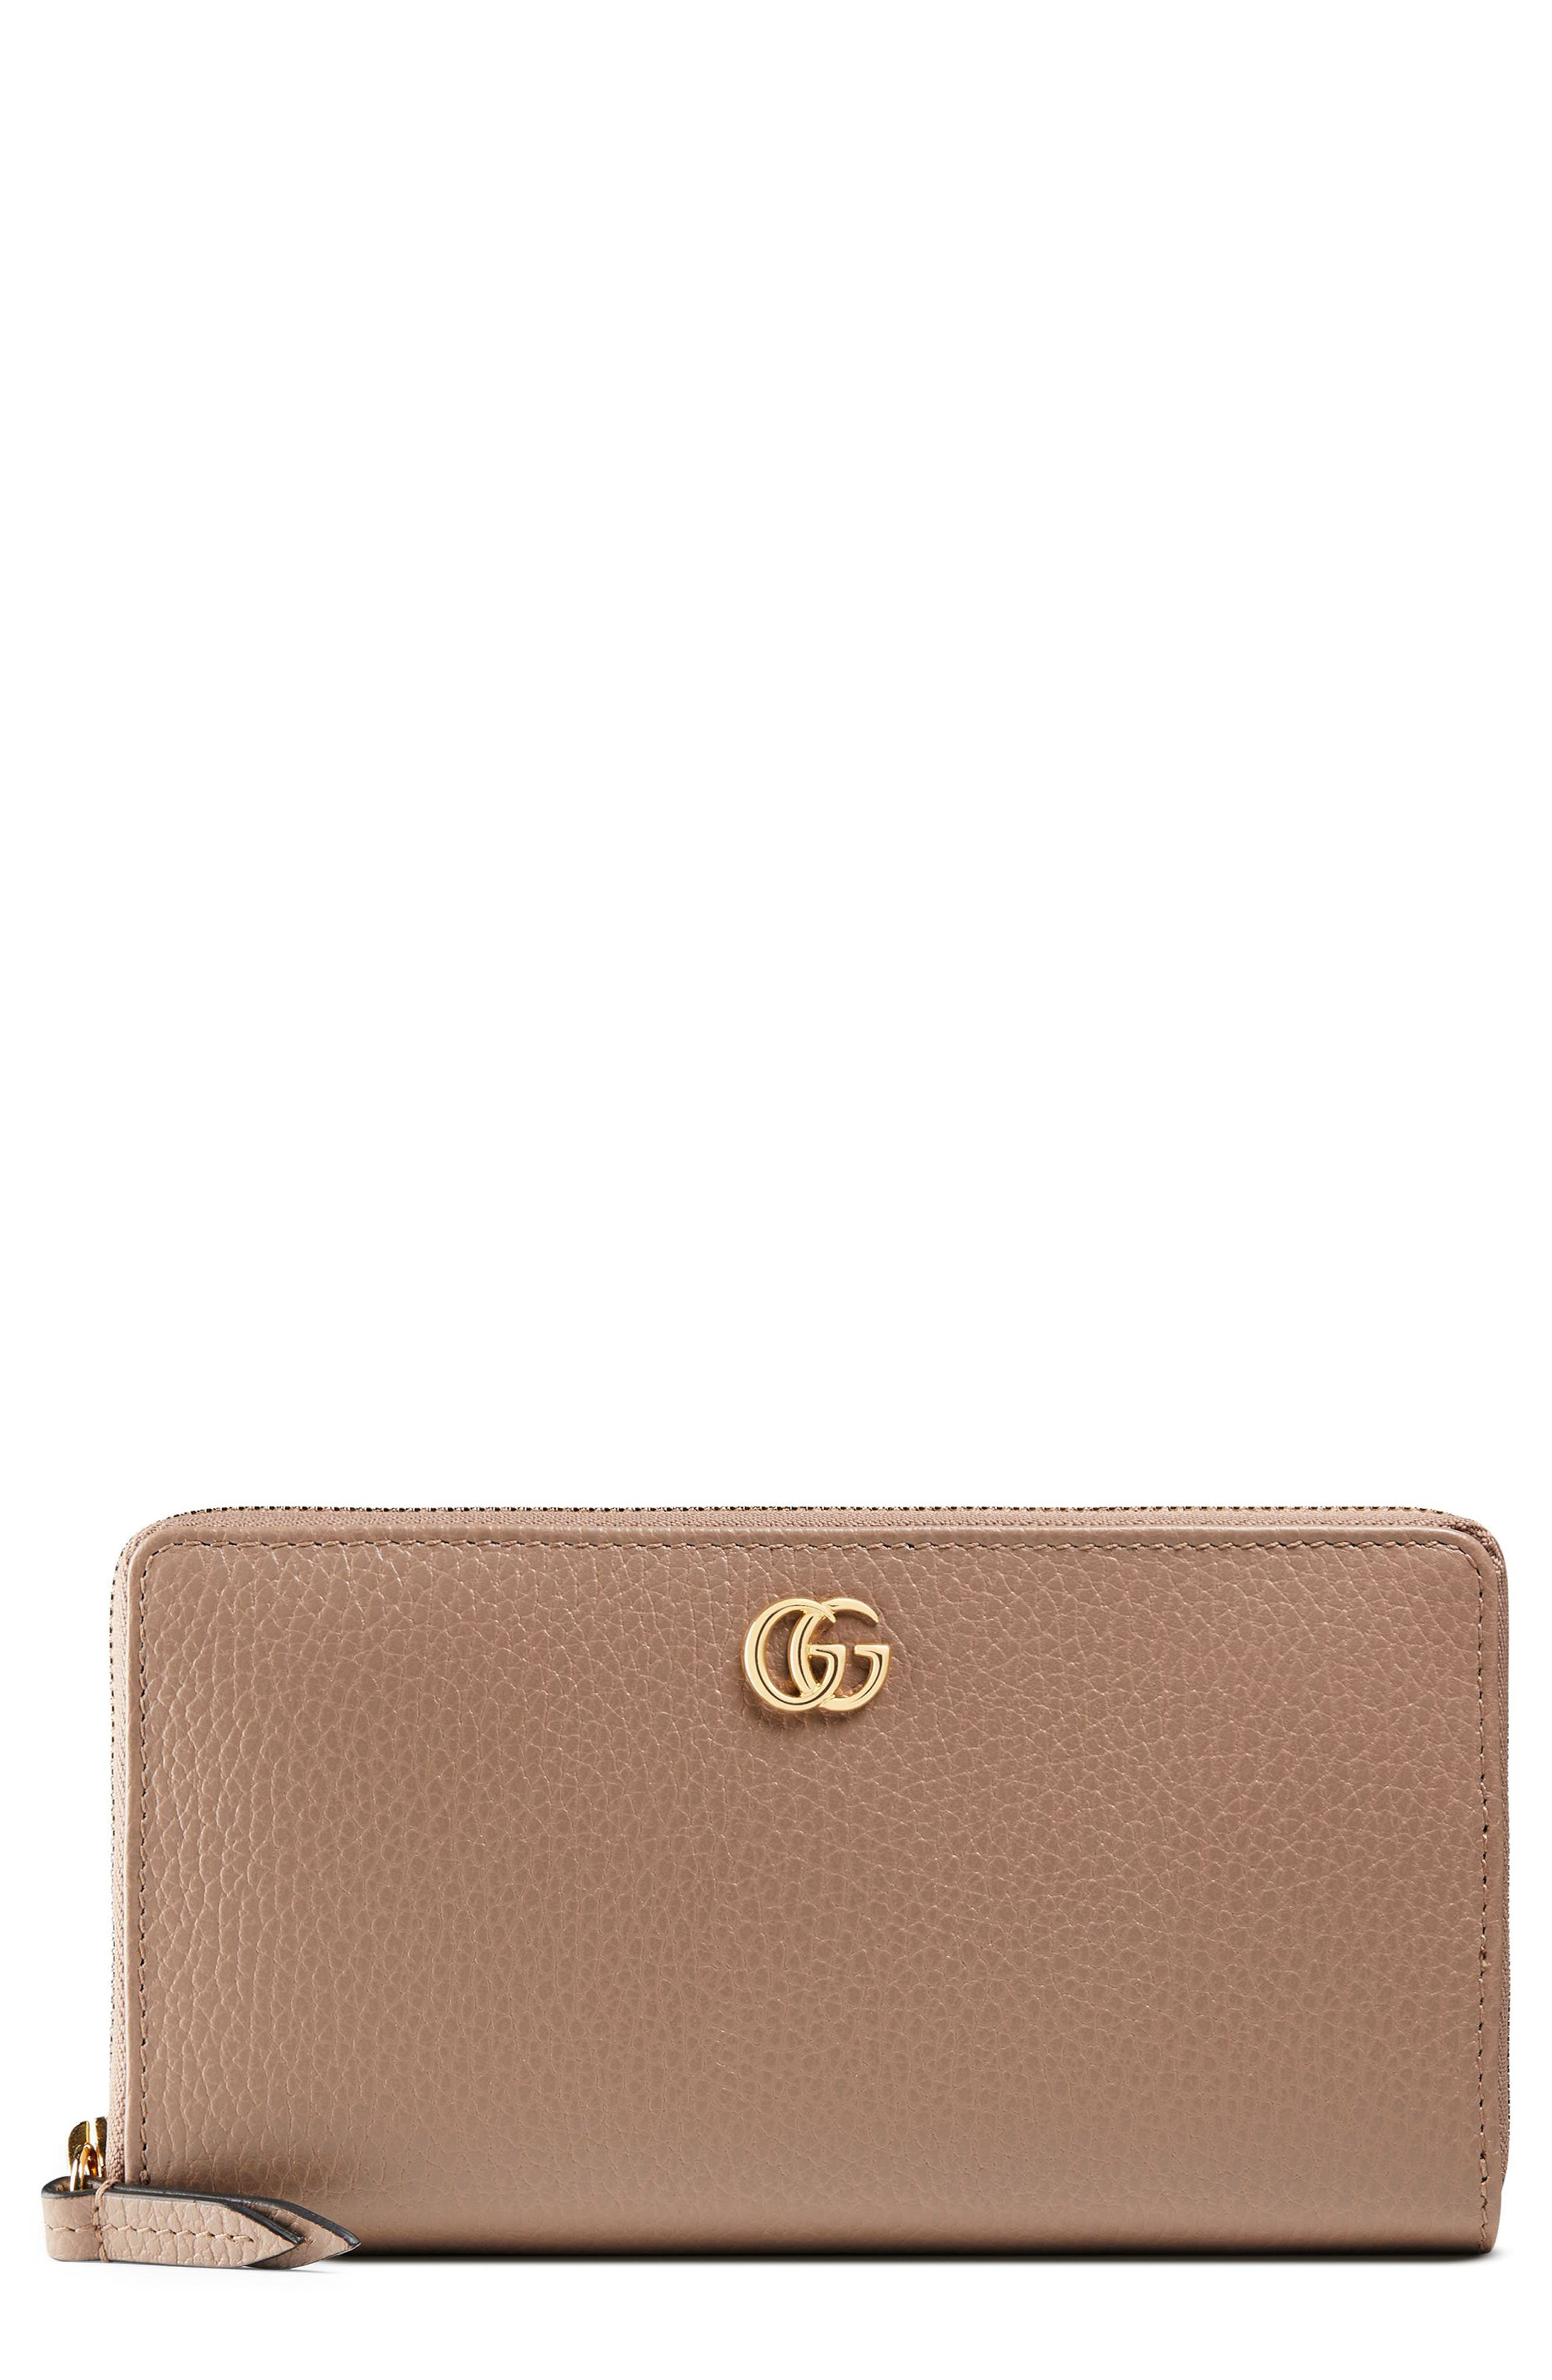 GUCCI, Petite Marmont Leather Zip Around Wallet, Main thumbnail 1, color, PORCELAIN ROSE